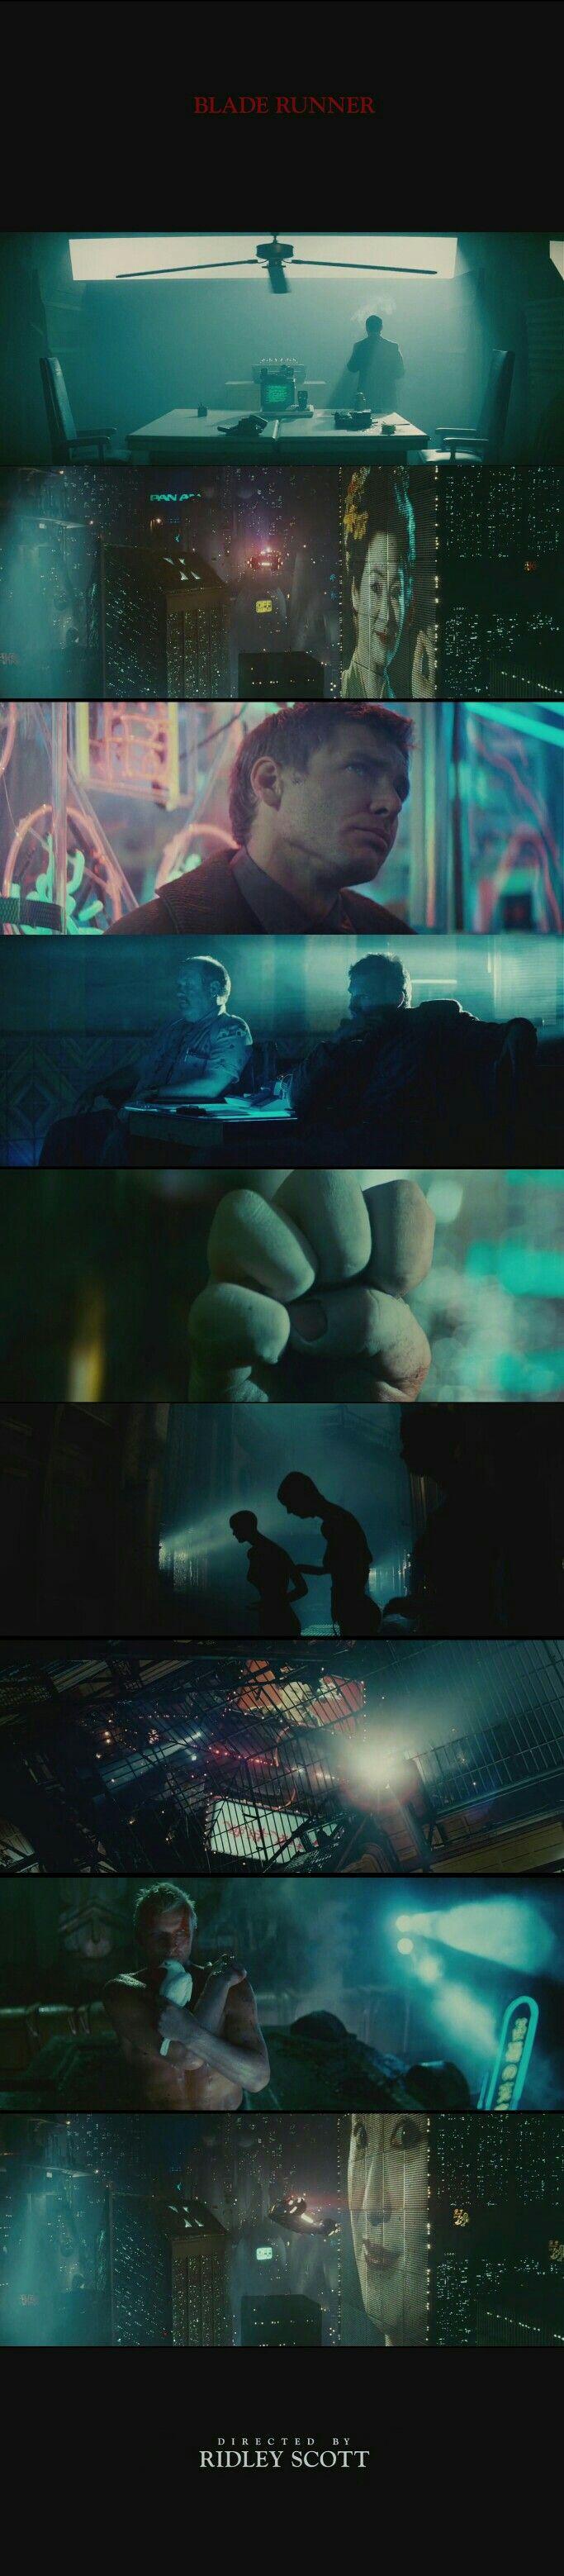 Blade Runner(1982) Directed by Ridley Scott. Cinematography by Jordan Cronenweth.